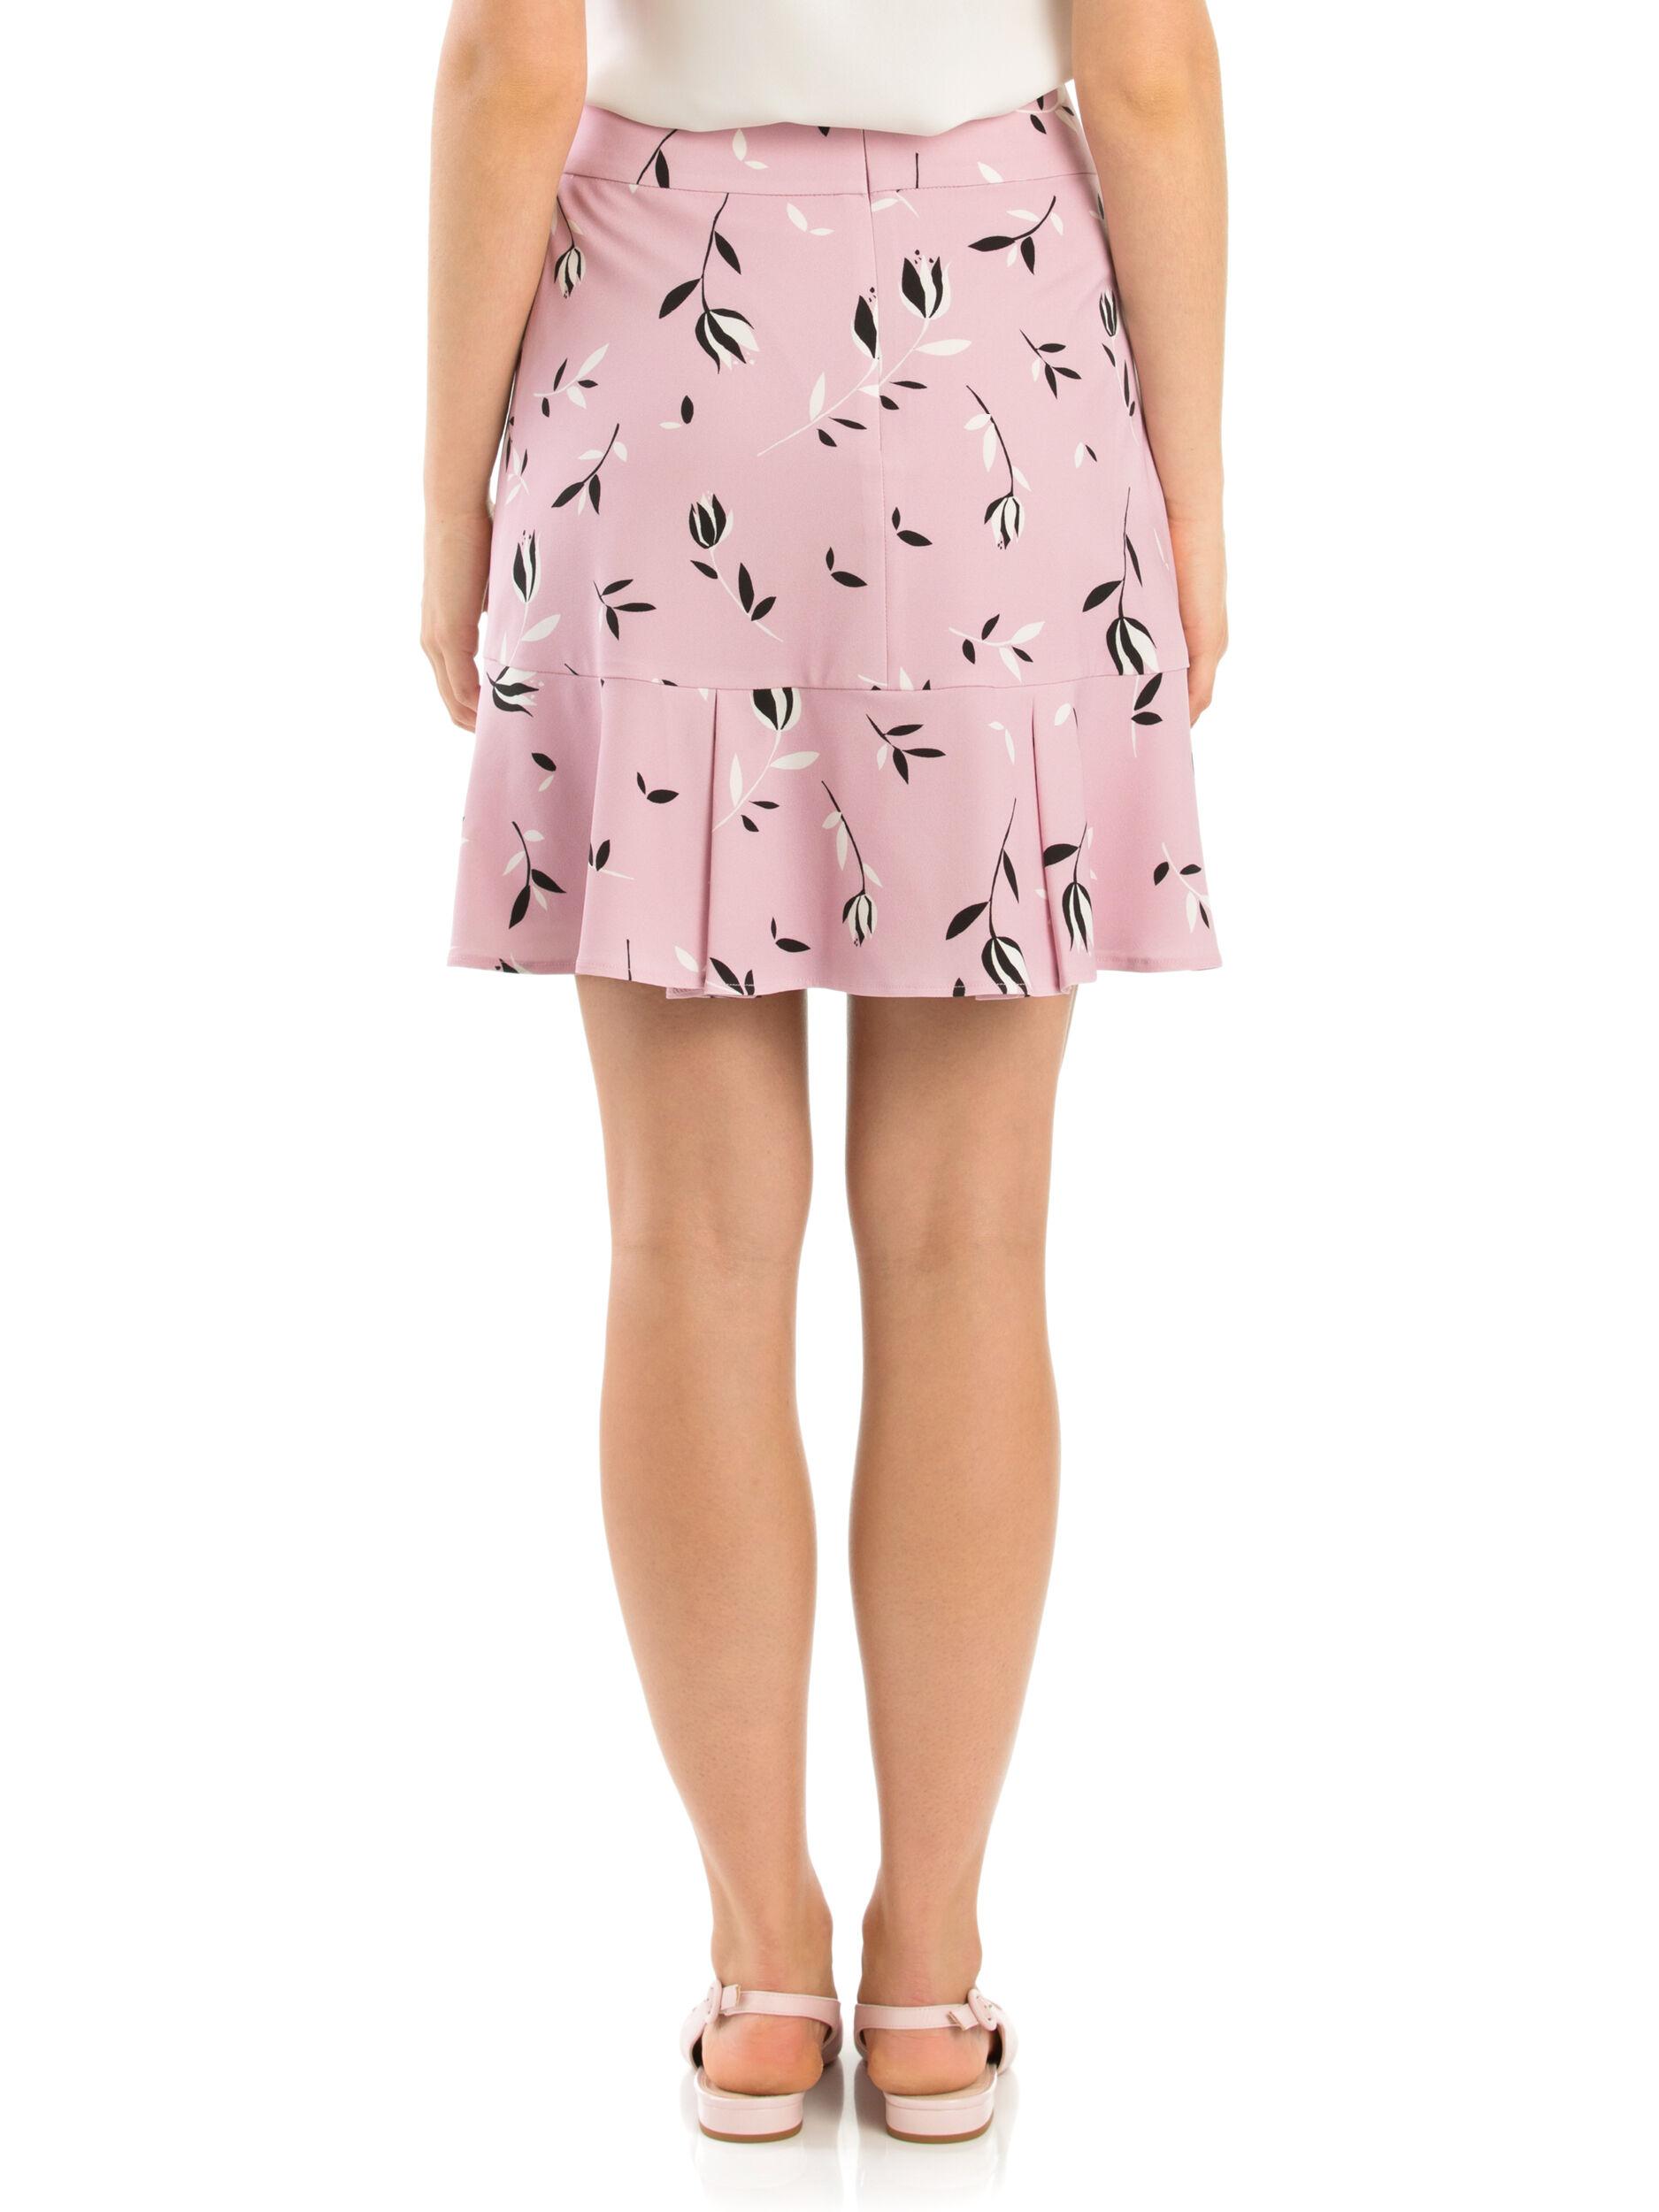 My Sweetheart Skirt